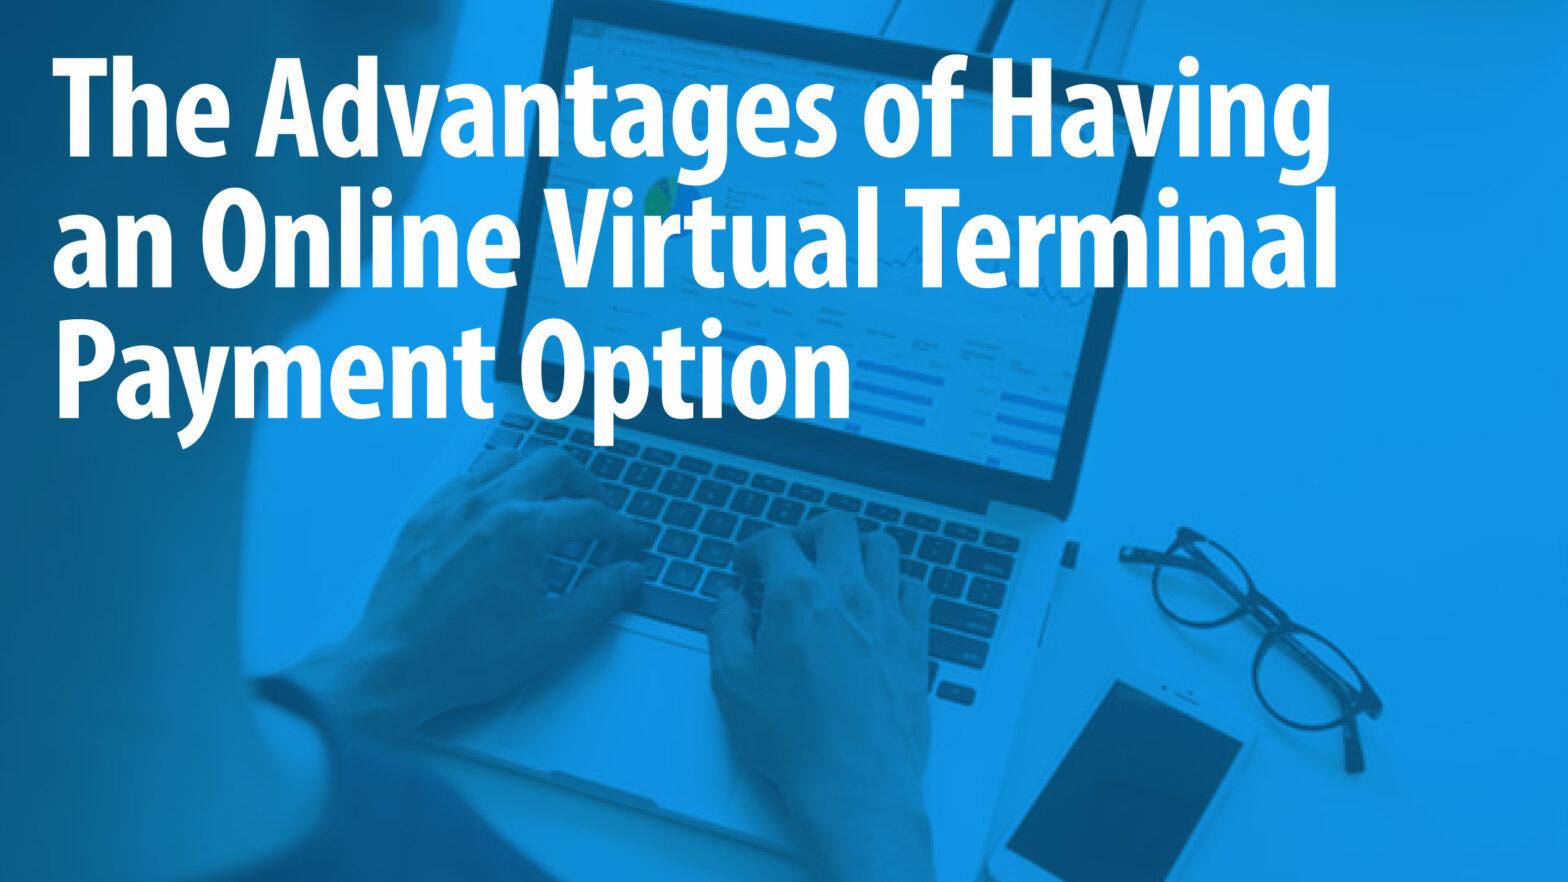 Virtual Terminal Option Article Header